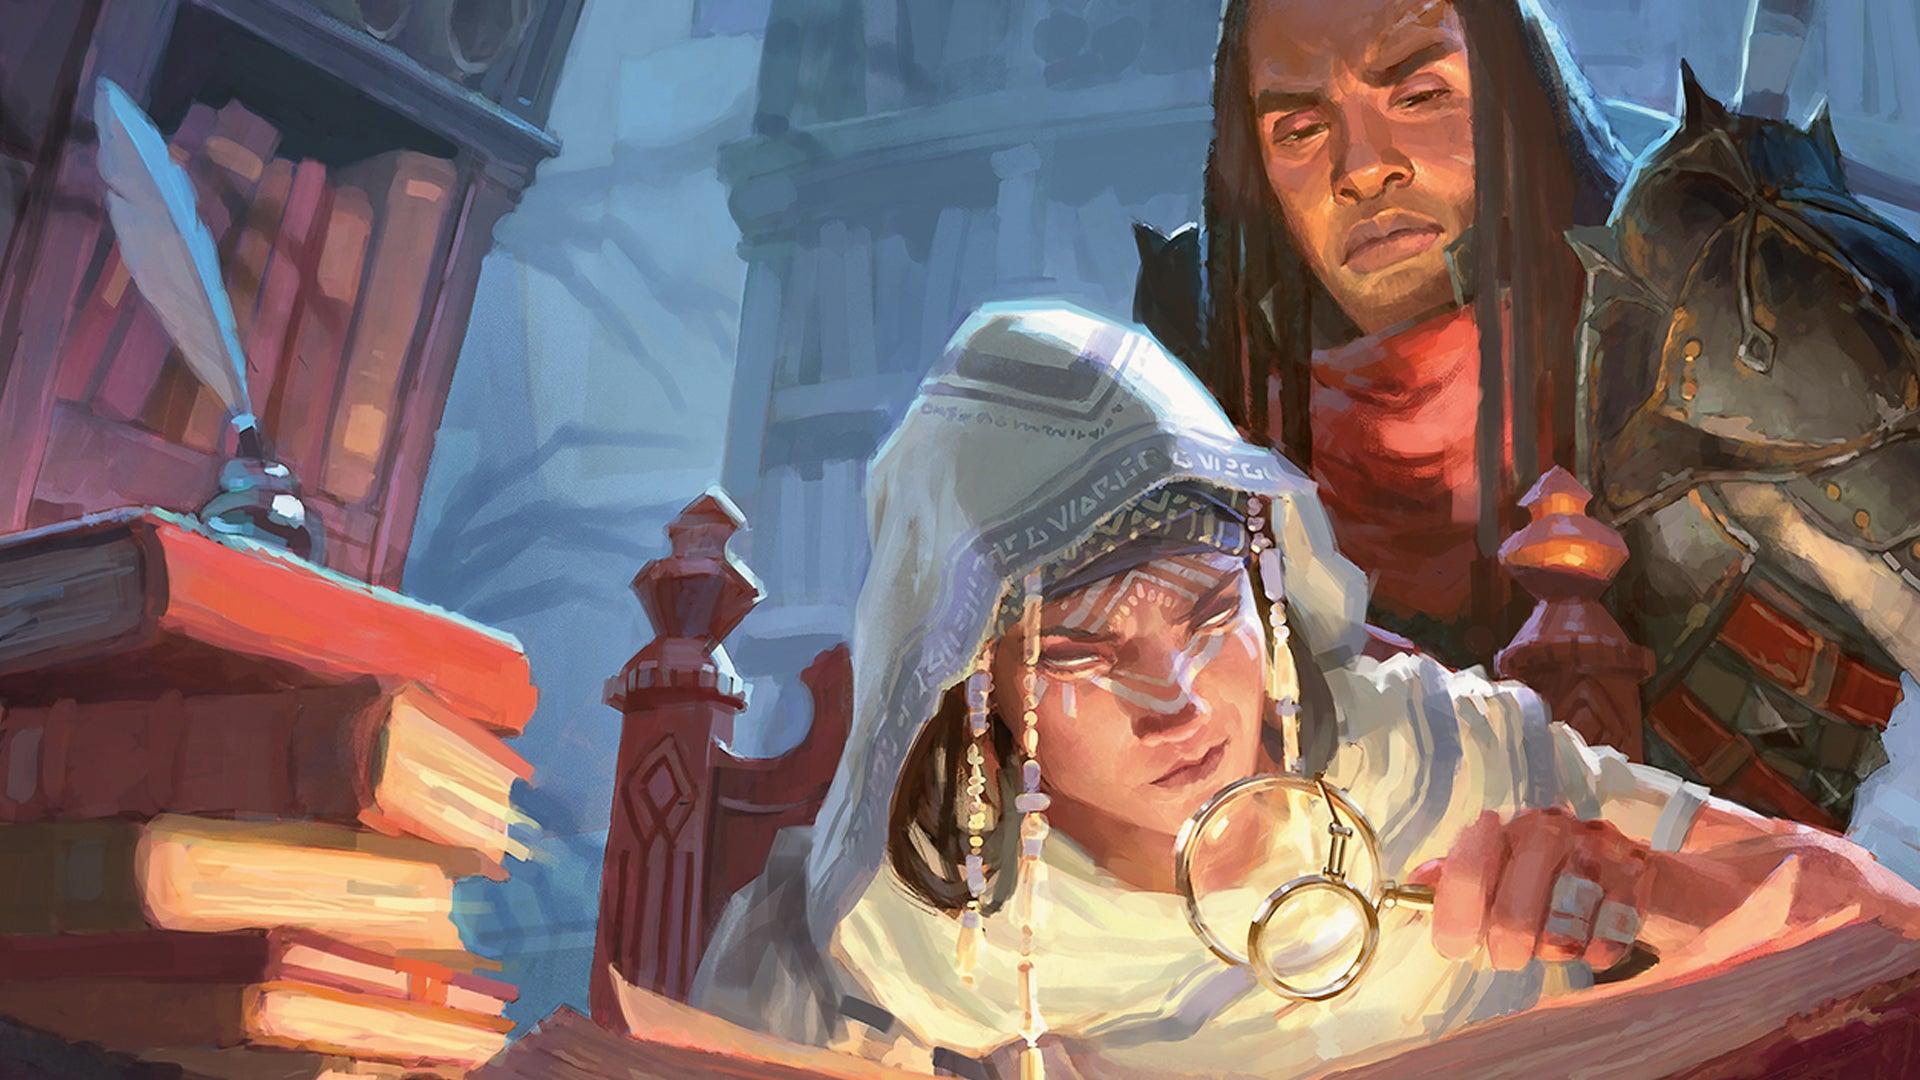 Candlekeep Mysteries artwork